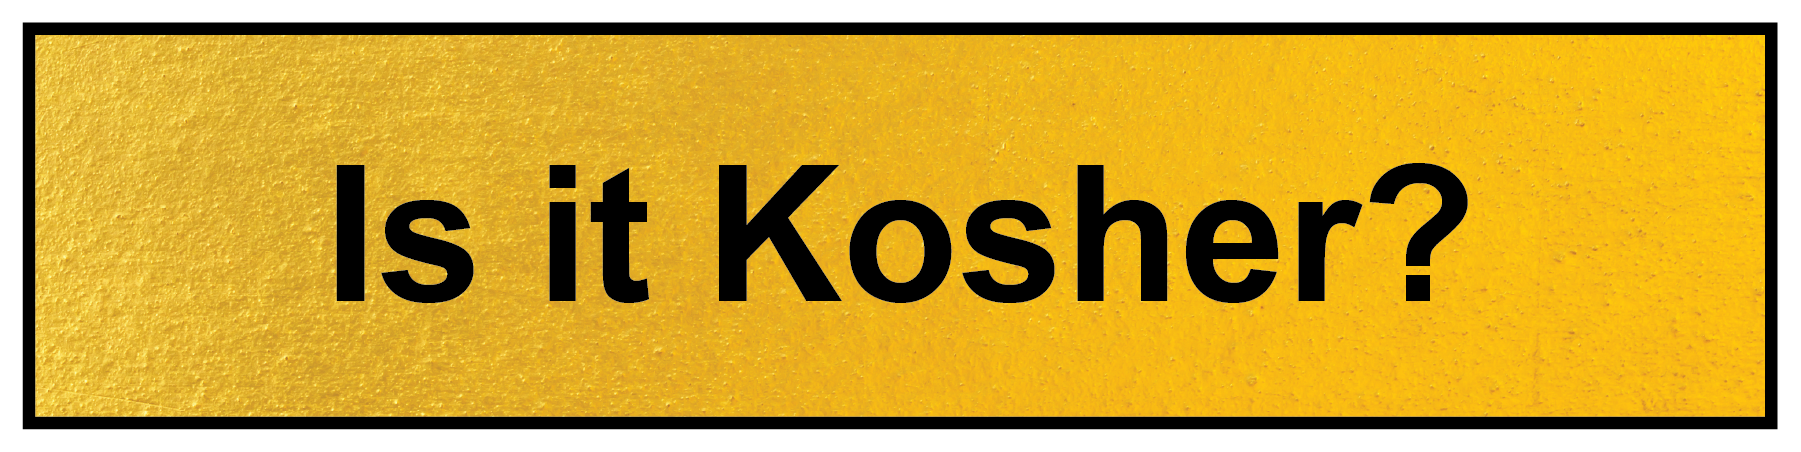 Is it kosher?